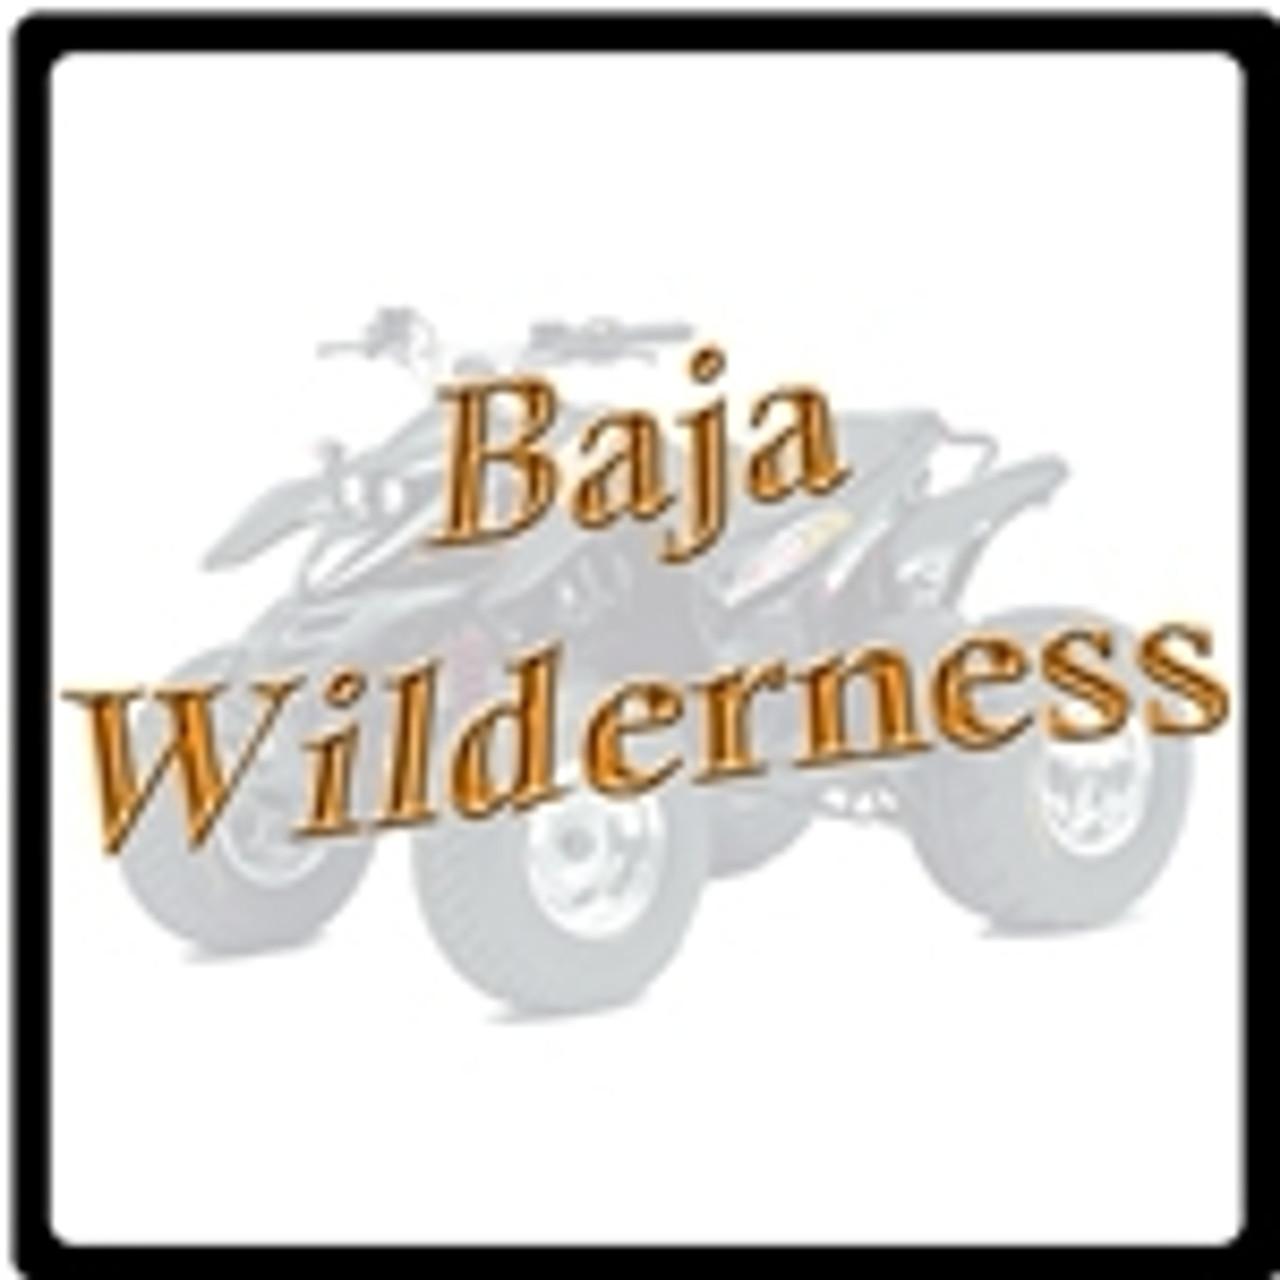 Baja Wilderness